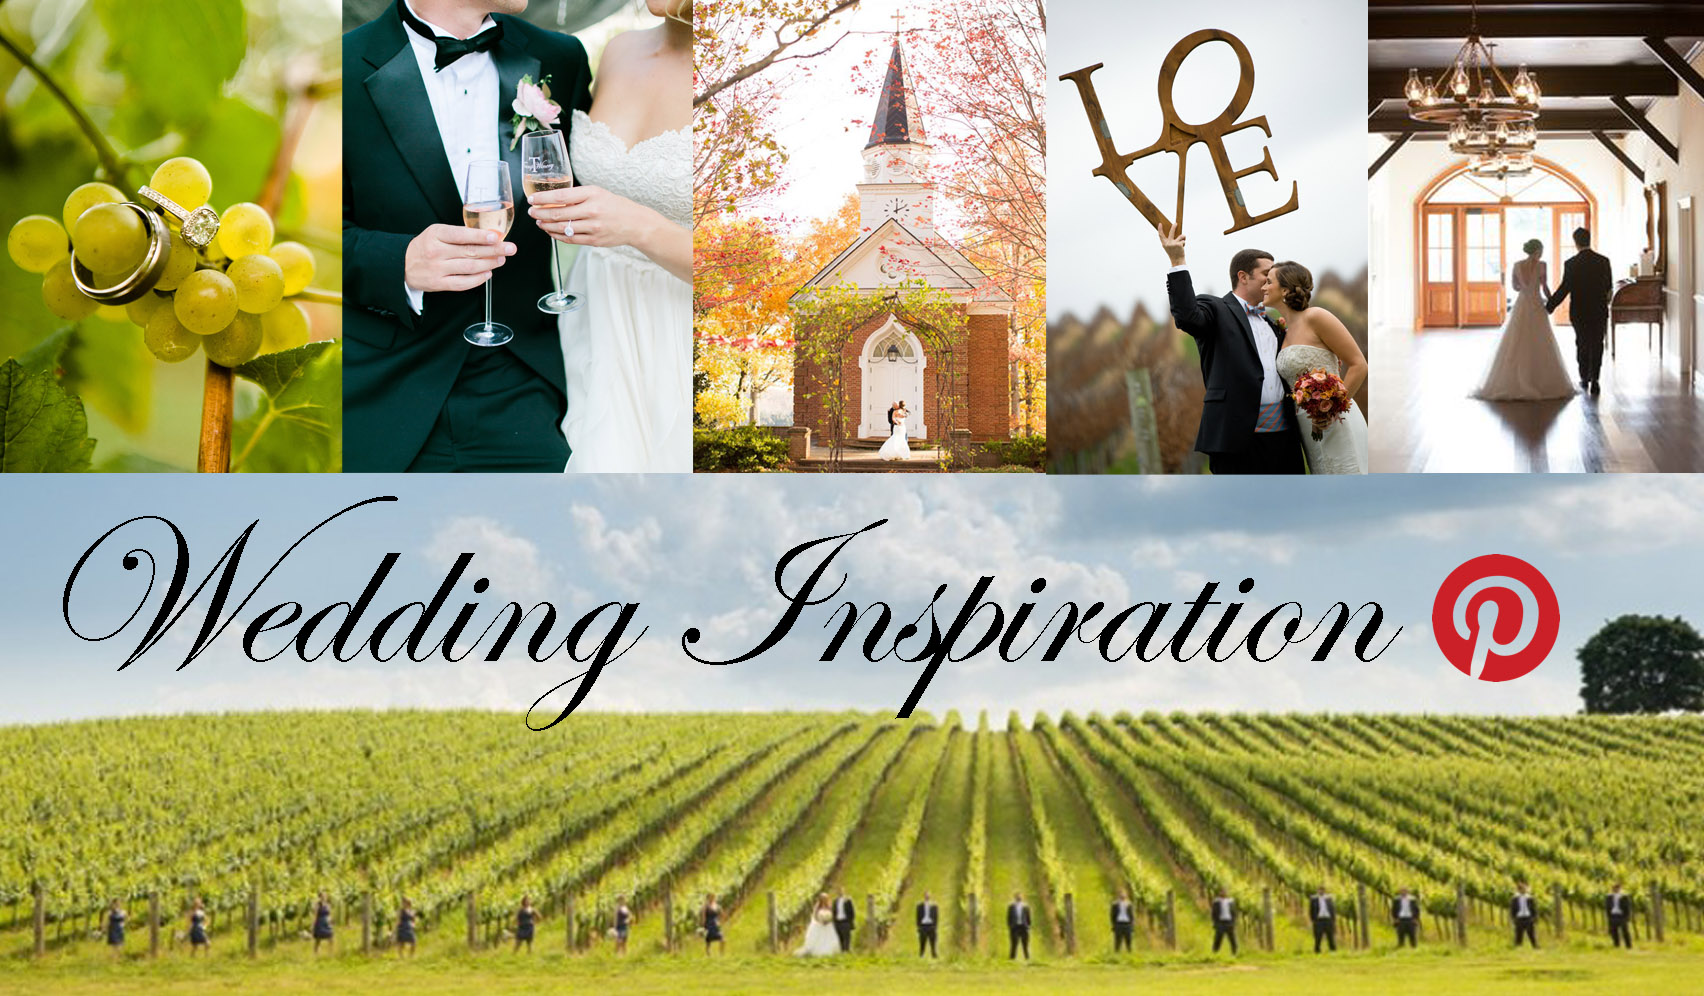 Wedding Pinterest Button copy1.jpg